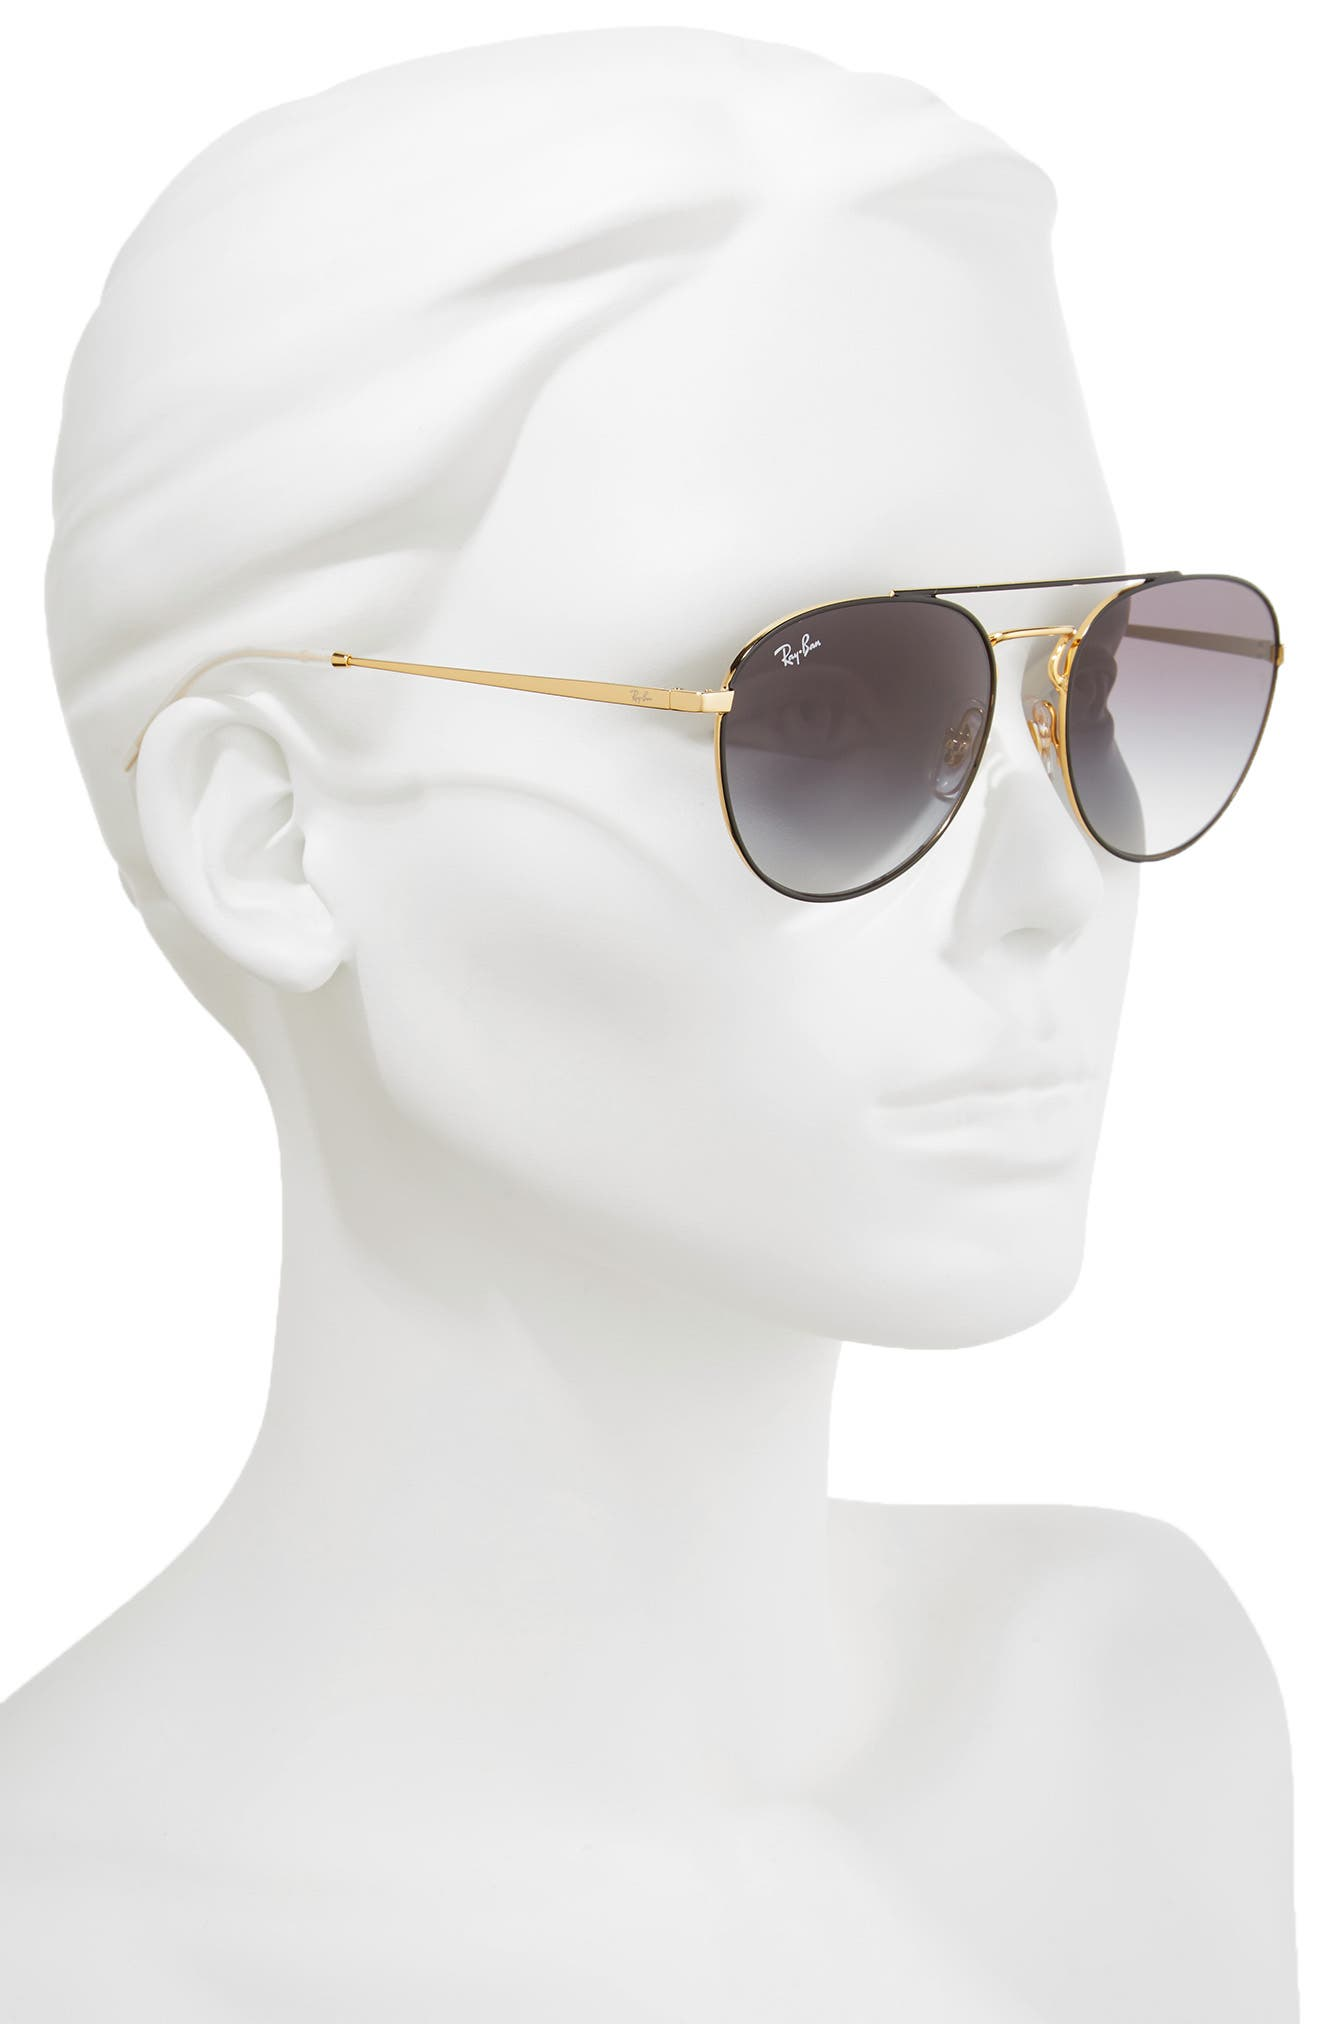 55mm Gradient Lens Round Aviator Sunglasses,                             Alternate thumbnail 3, color,                             001